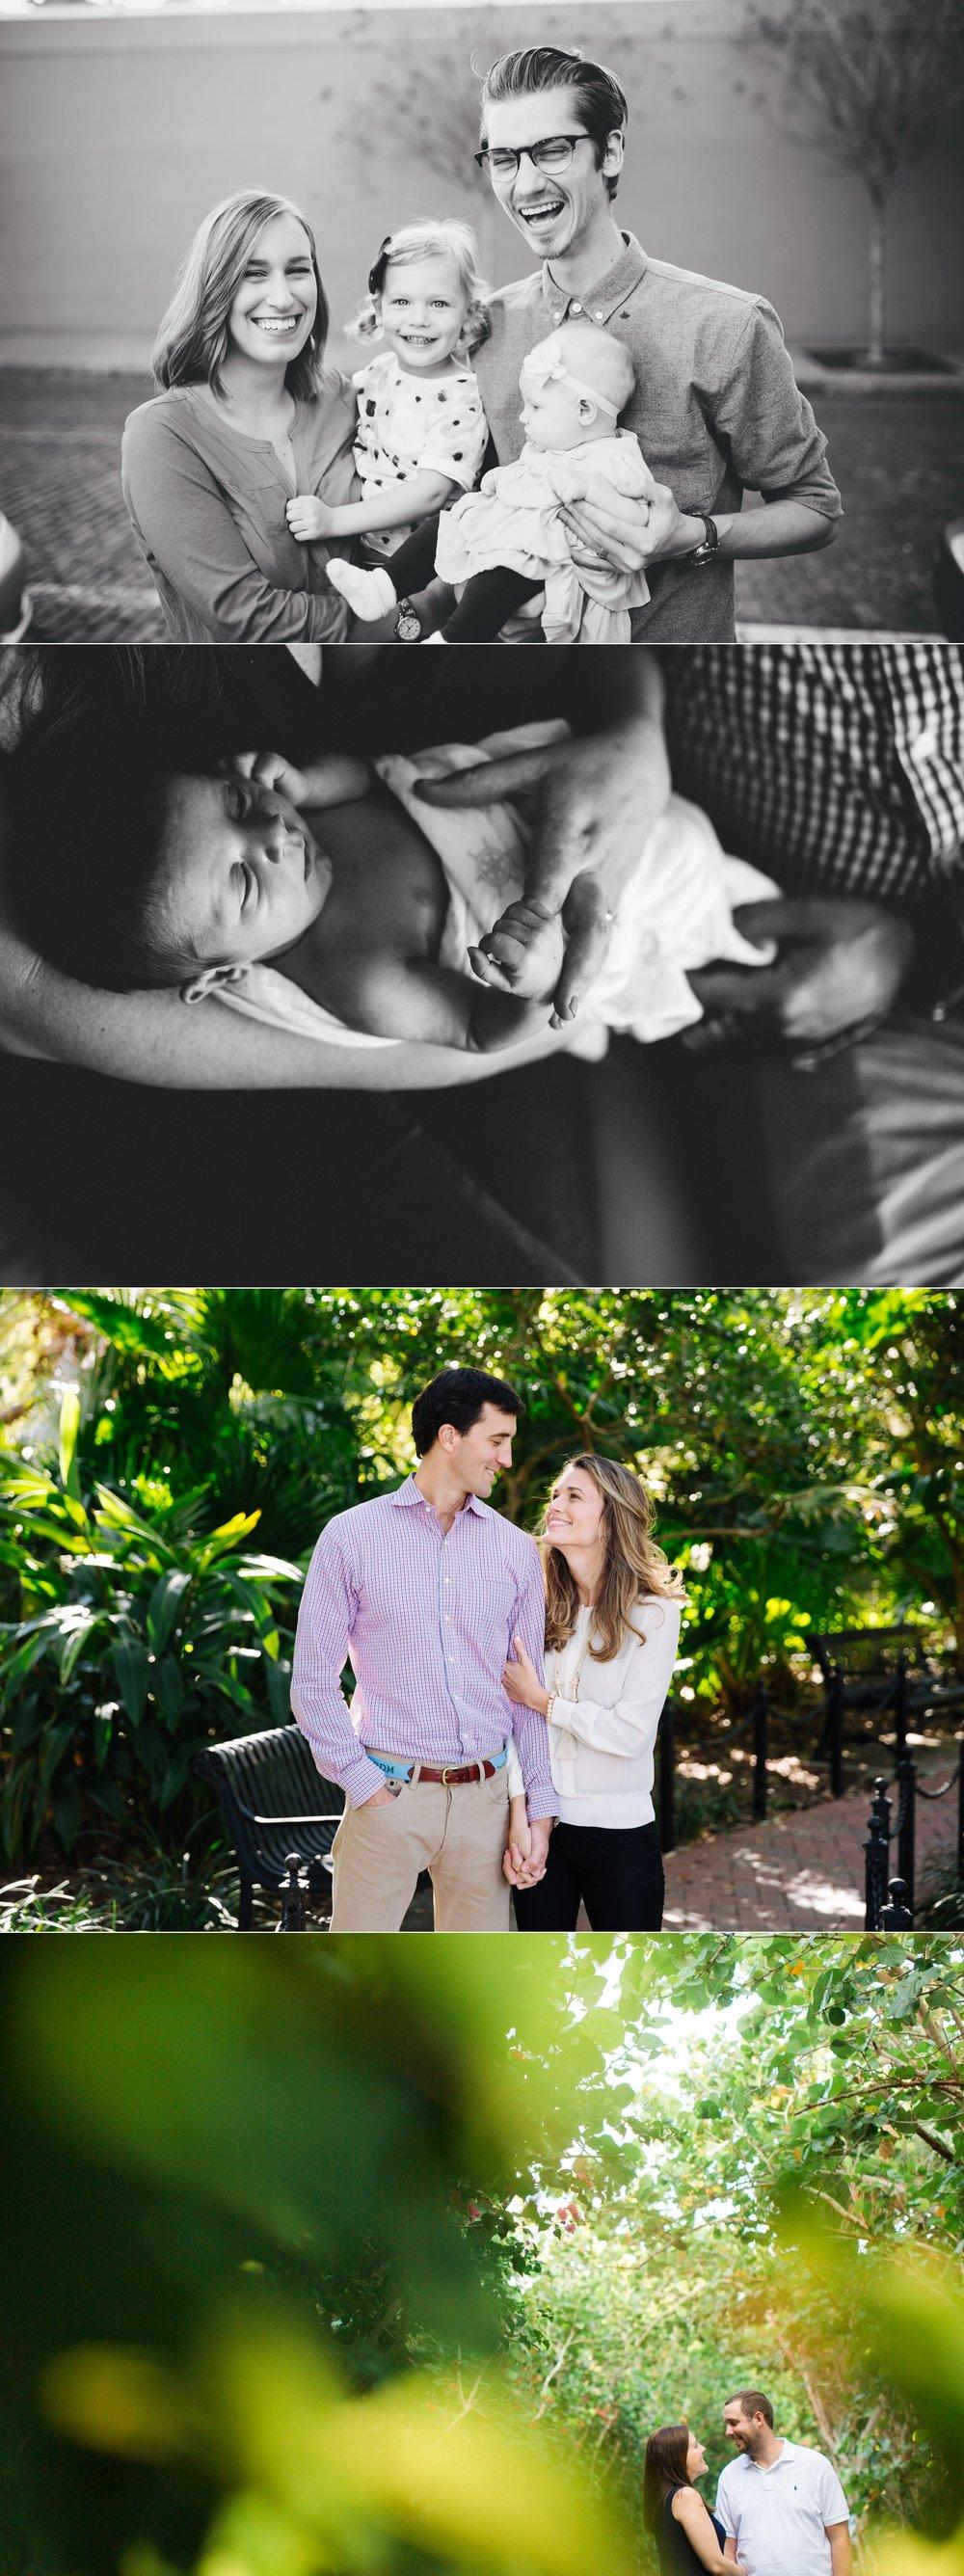 Jake & Katie's Best of Families 2016-003.jpg